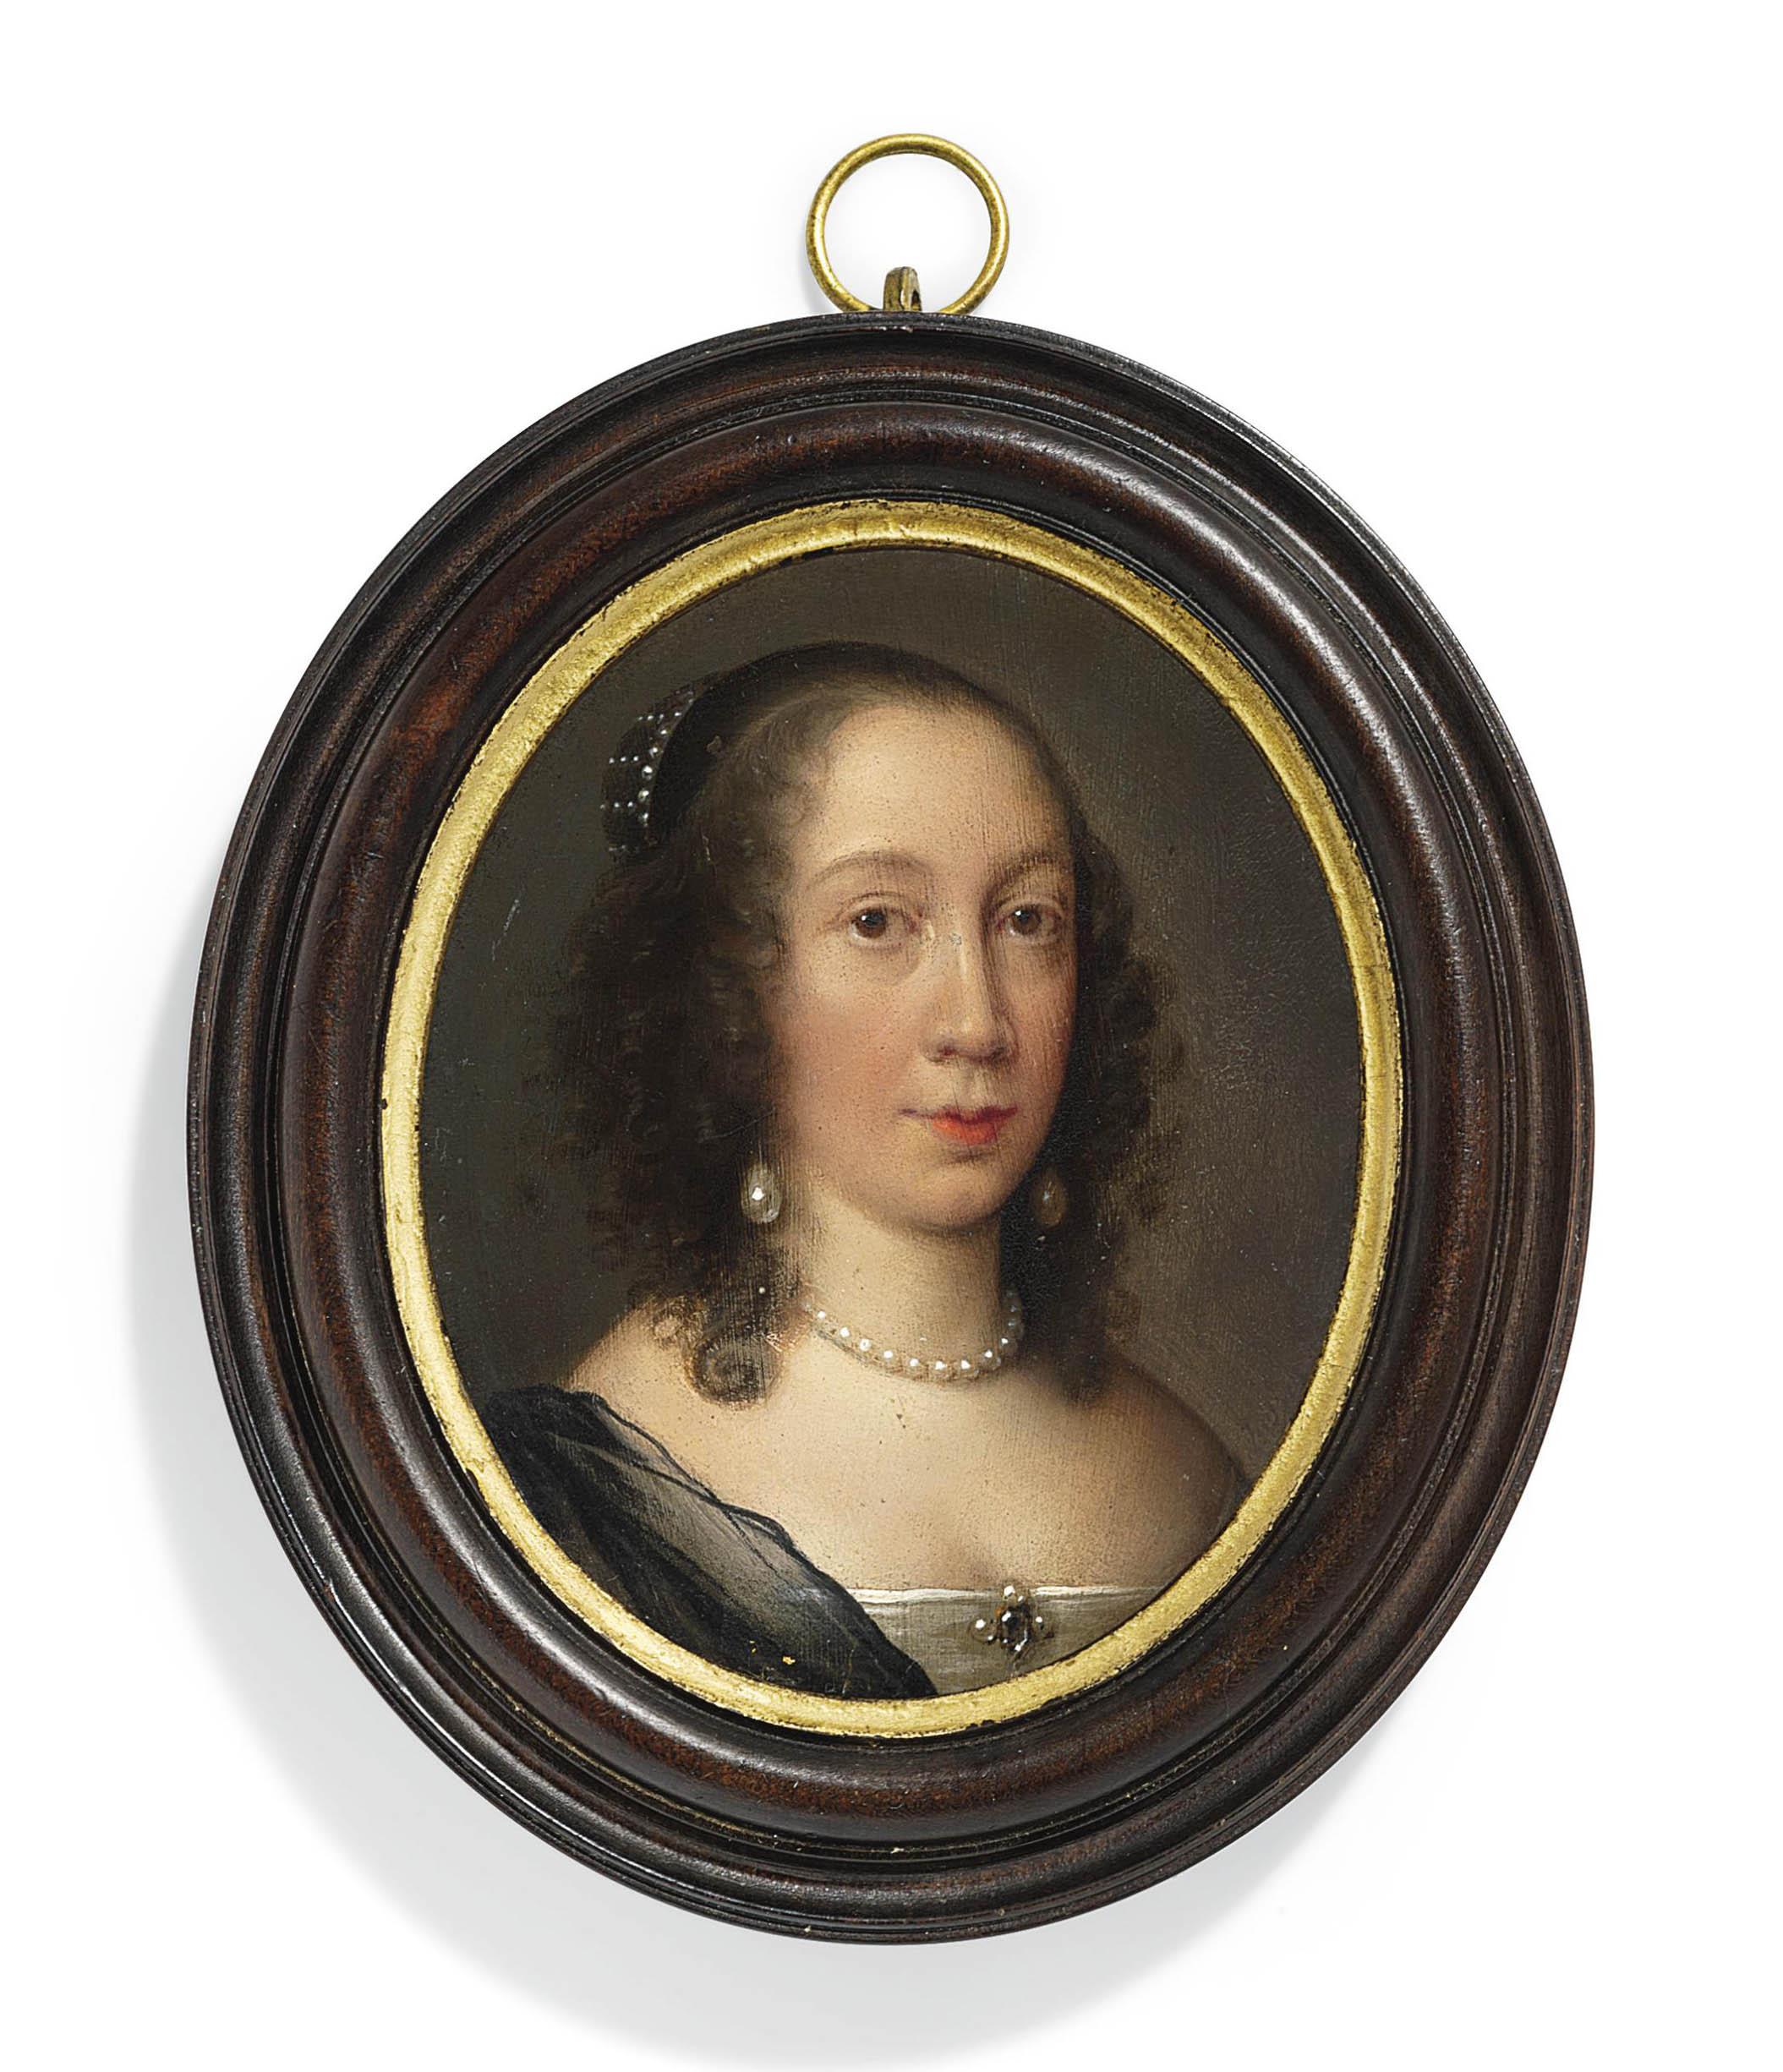 CORNELIS JONSON VAN CEULEN (ANGLO-DUTCH, 1593-1661/2)